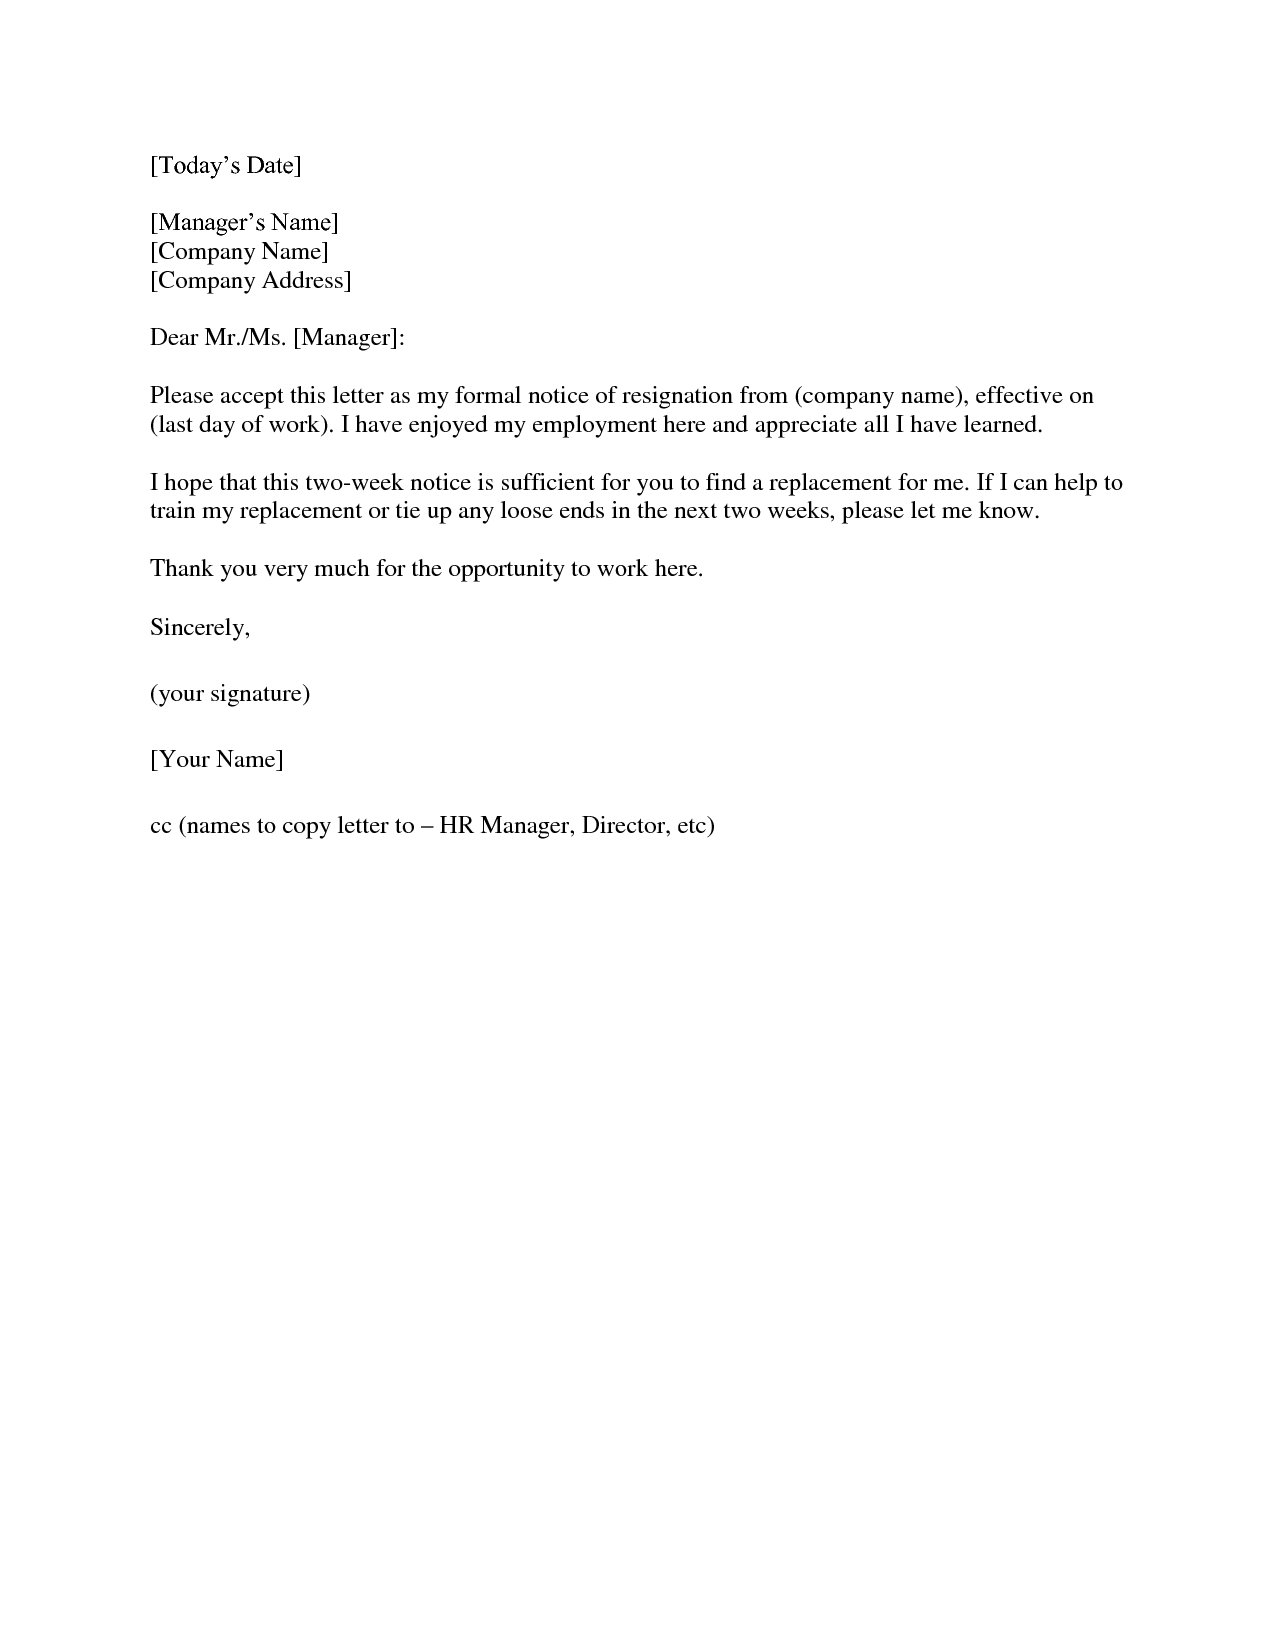 Letter Of Resignation Teacher Template - 2 Weeks Notice Letter Resignation Letter 2 Week Notice